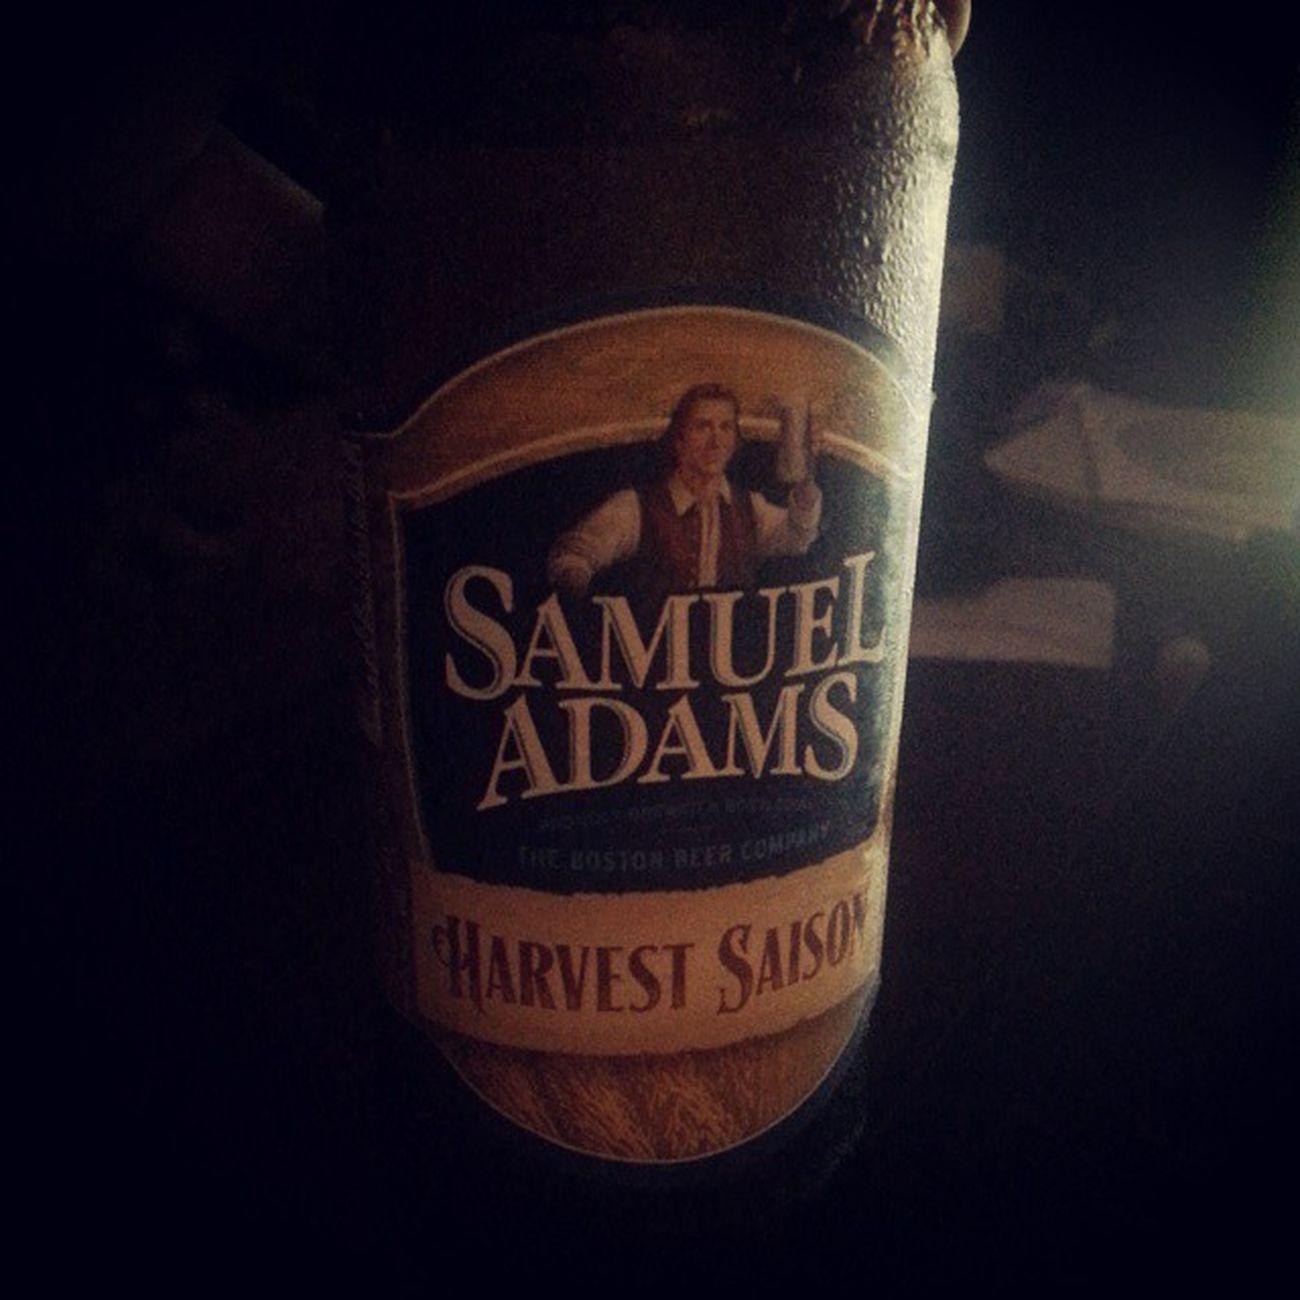 Next up!! Samueladams Harvest Beer